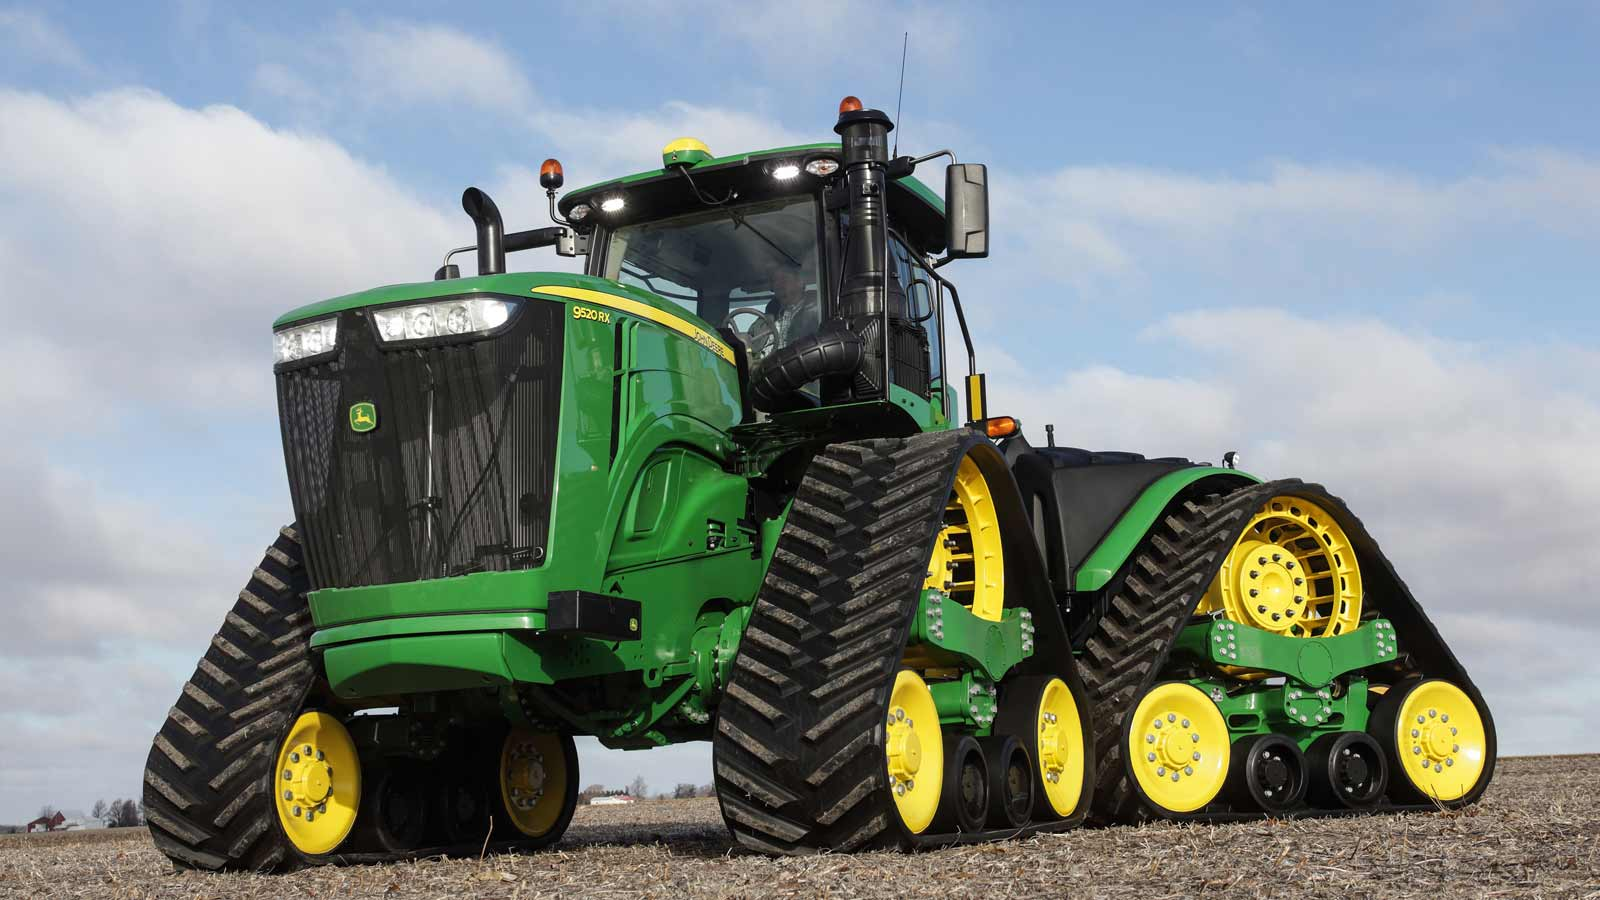 traktor ausmalbilder john deere  traktor ausmalbilder